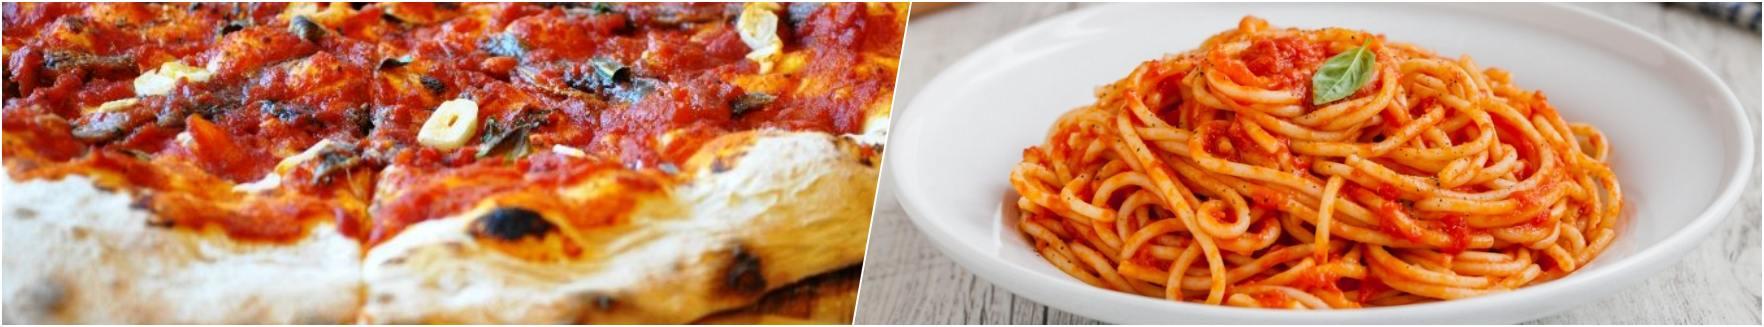 napoli food